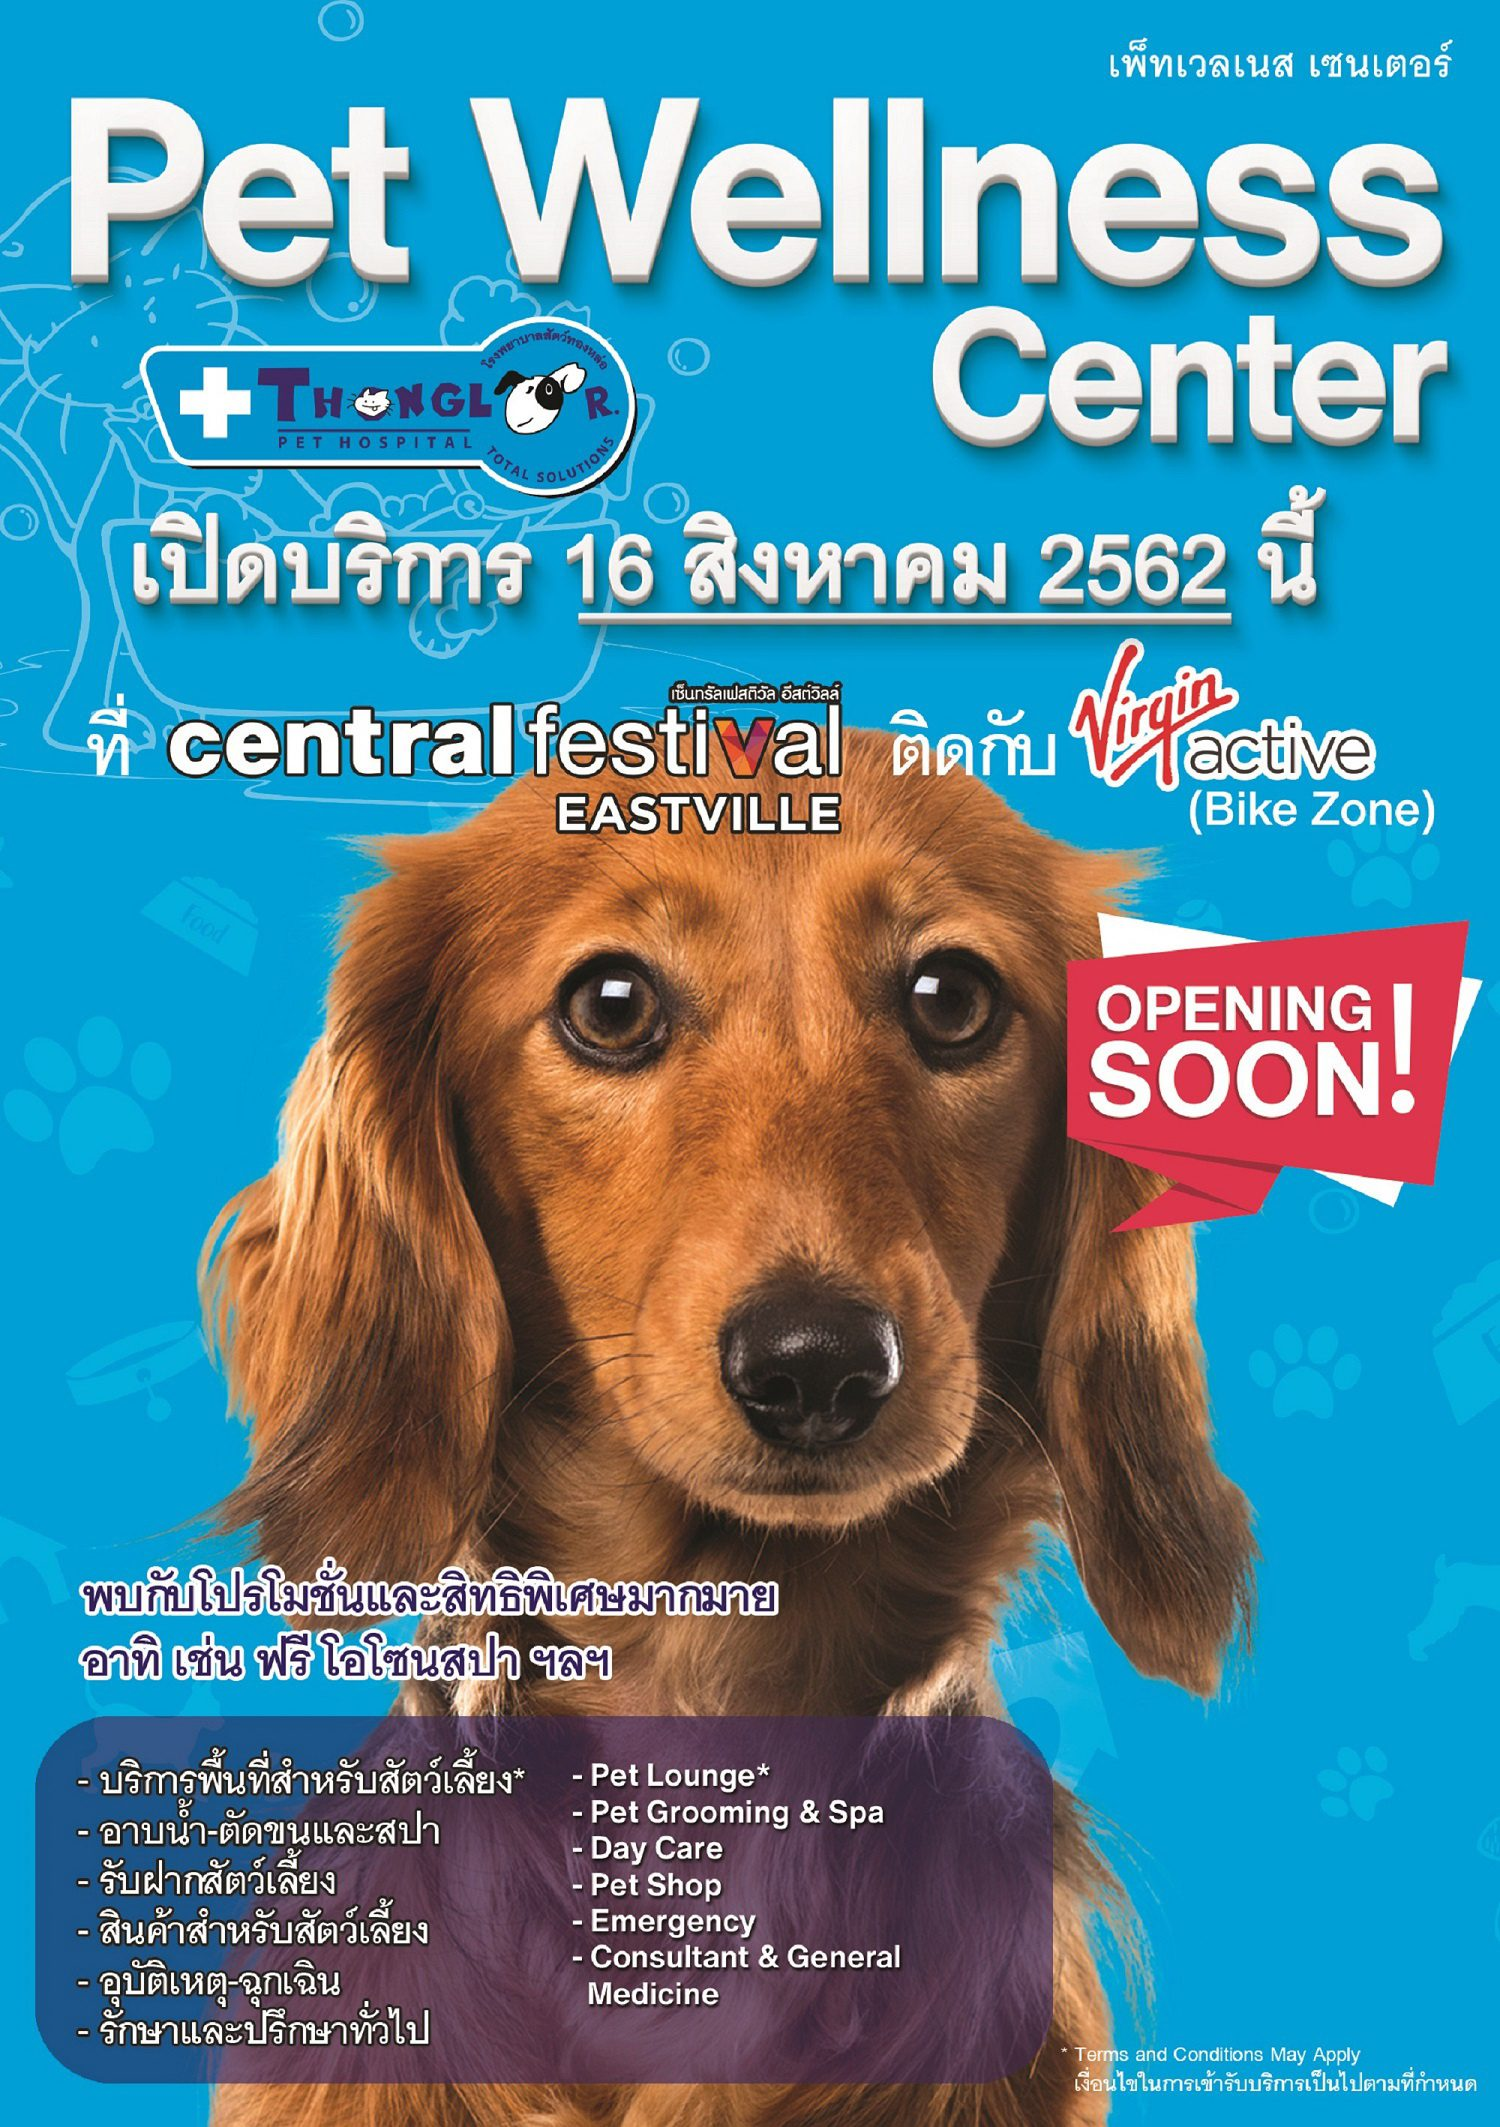 Pet Wellness Center รพส.ทองหล่อ  พร้อมเปิดบริการแล้วที่ Central EastVille